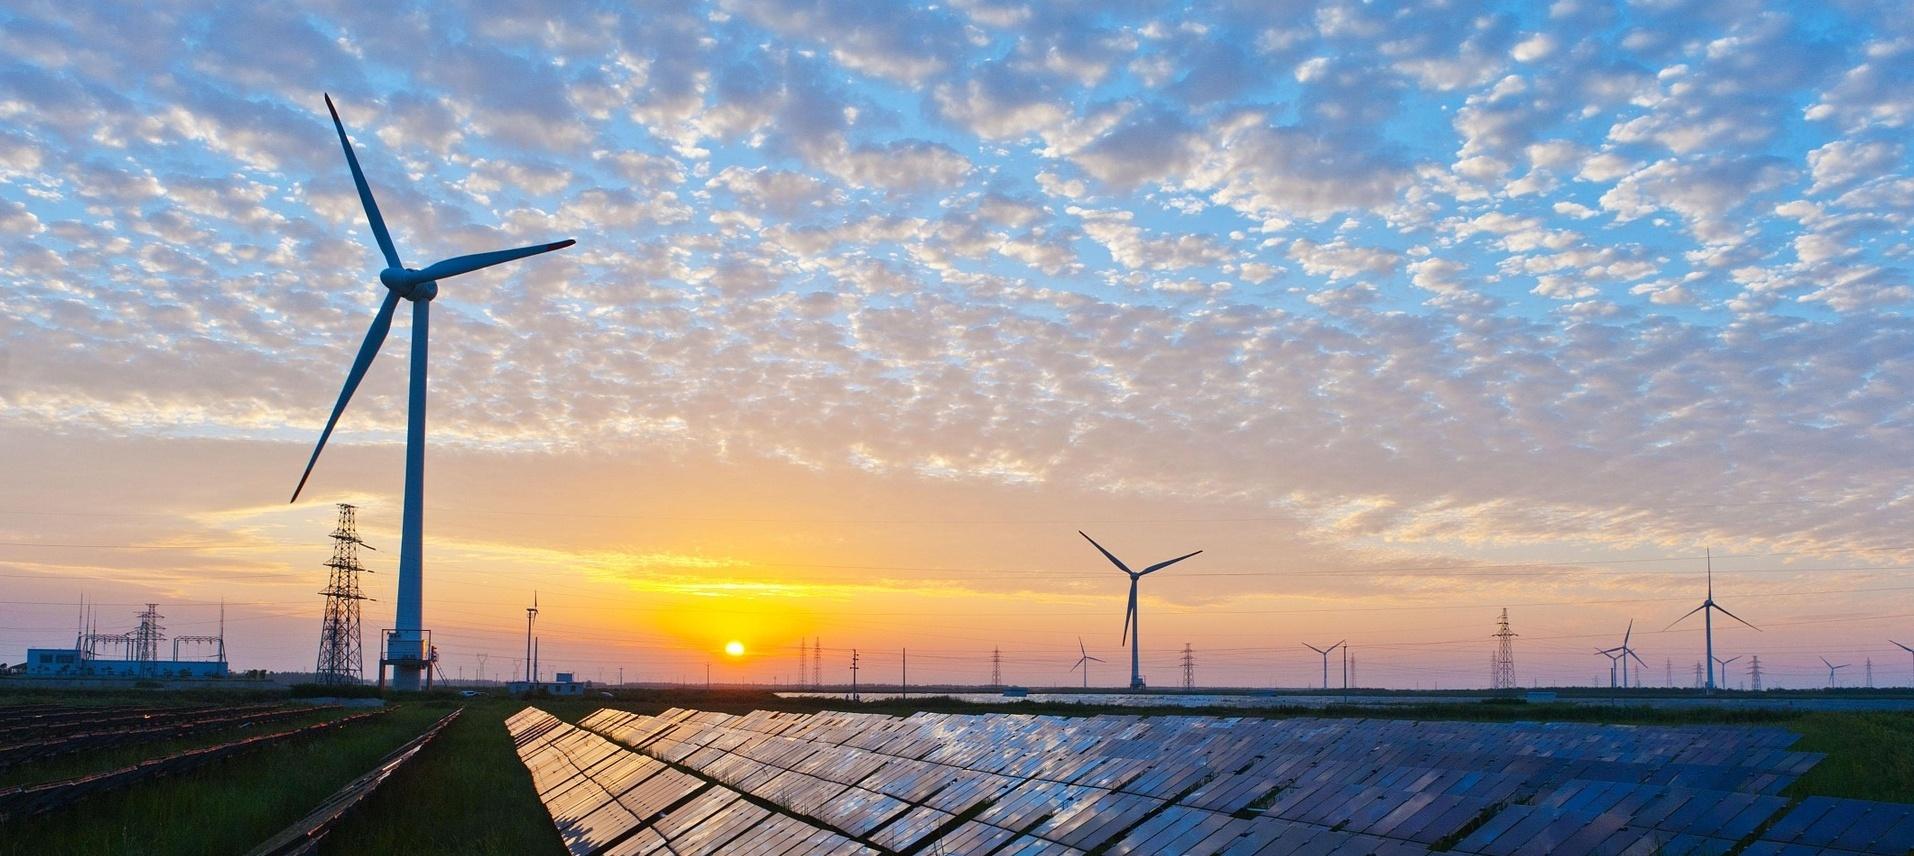 electricity-solar-wind-sunset-366812-edited.jpg